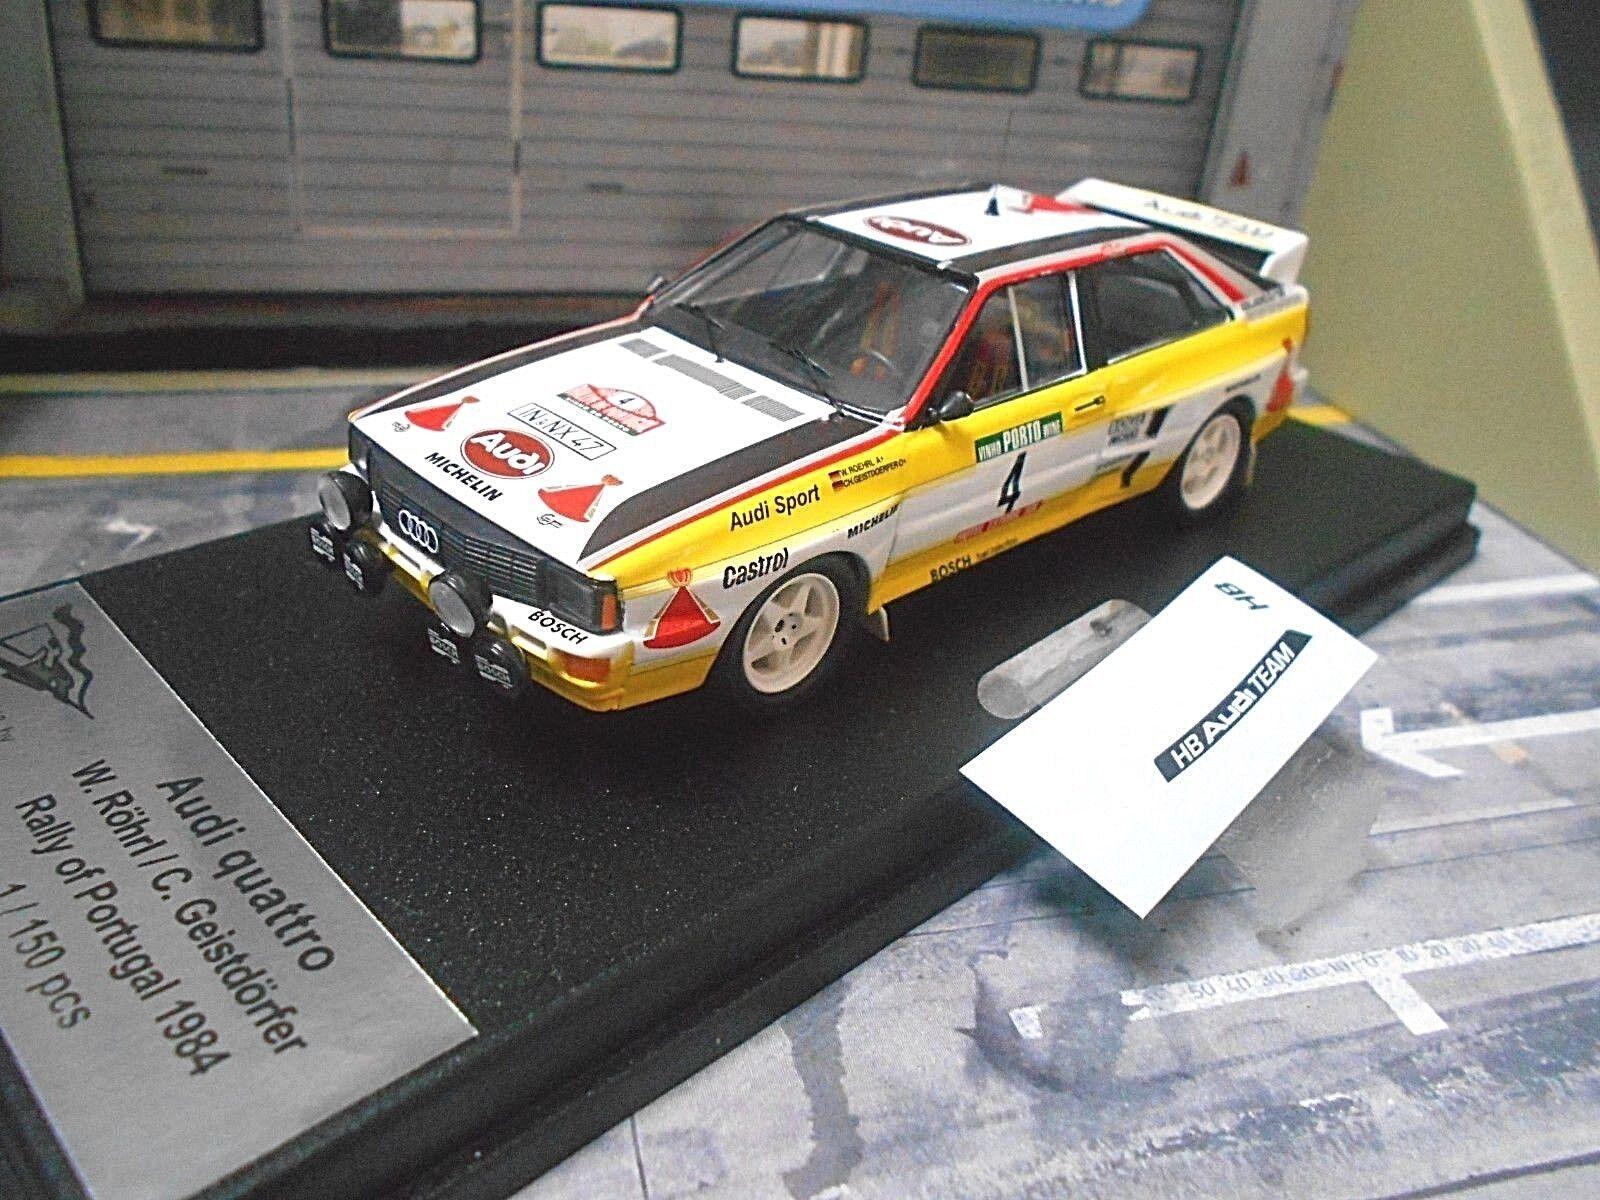 AUDI QUATTRO RALLYE coupe du monde Portugal TAP 1984  4 Röhrl HB Limited 1 150 Trofeu 1 43